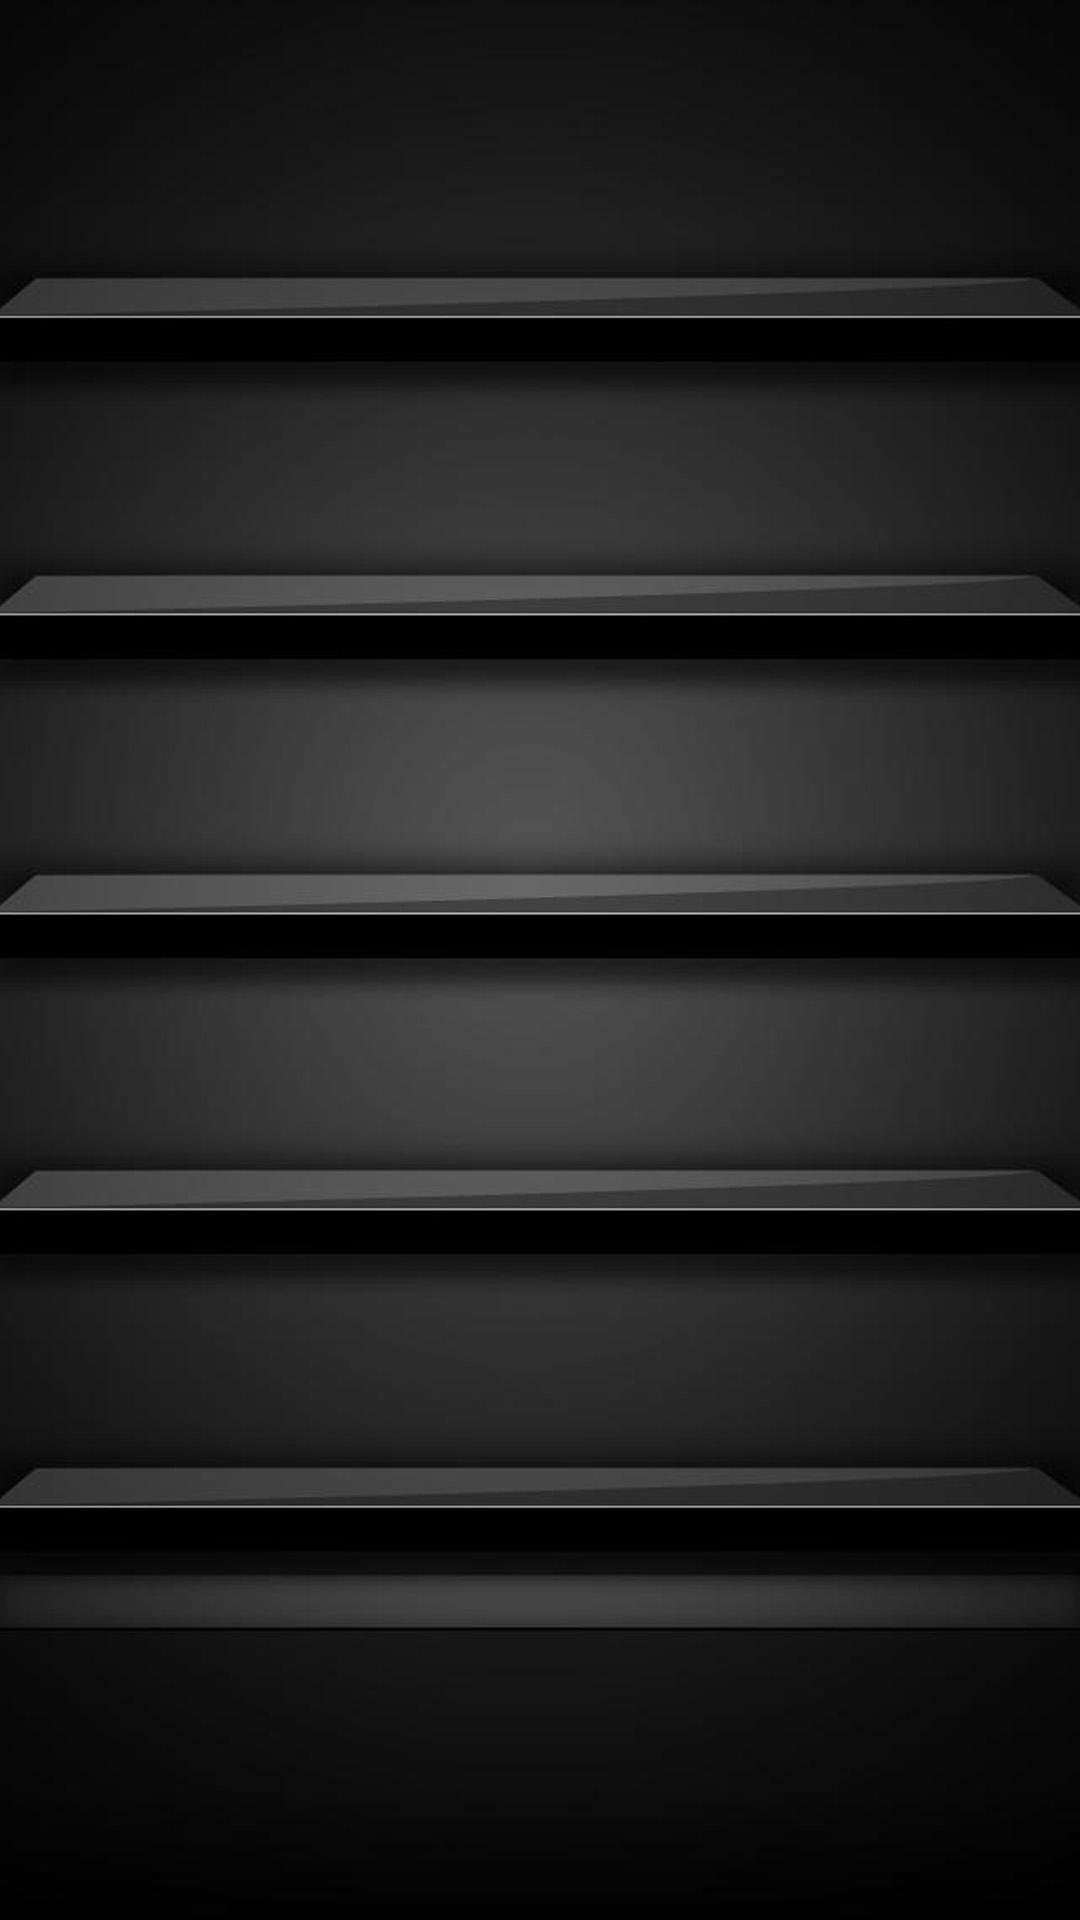 Free Download Black Shelf Iphone 6 Hd Lock Screen Wallpapers